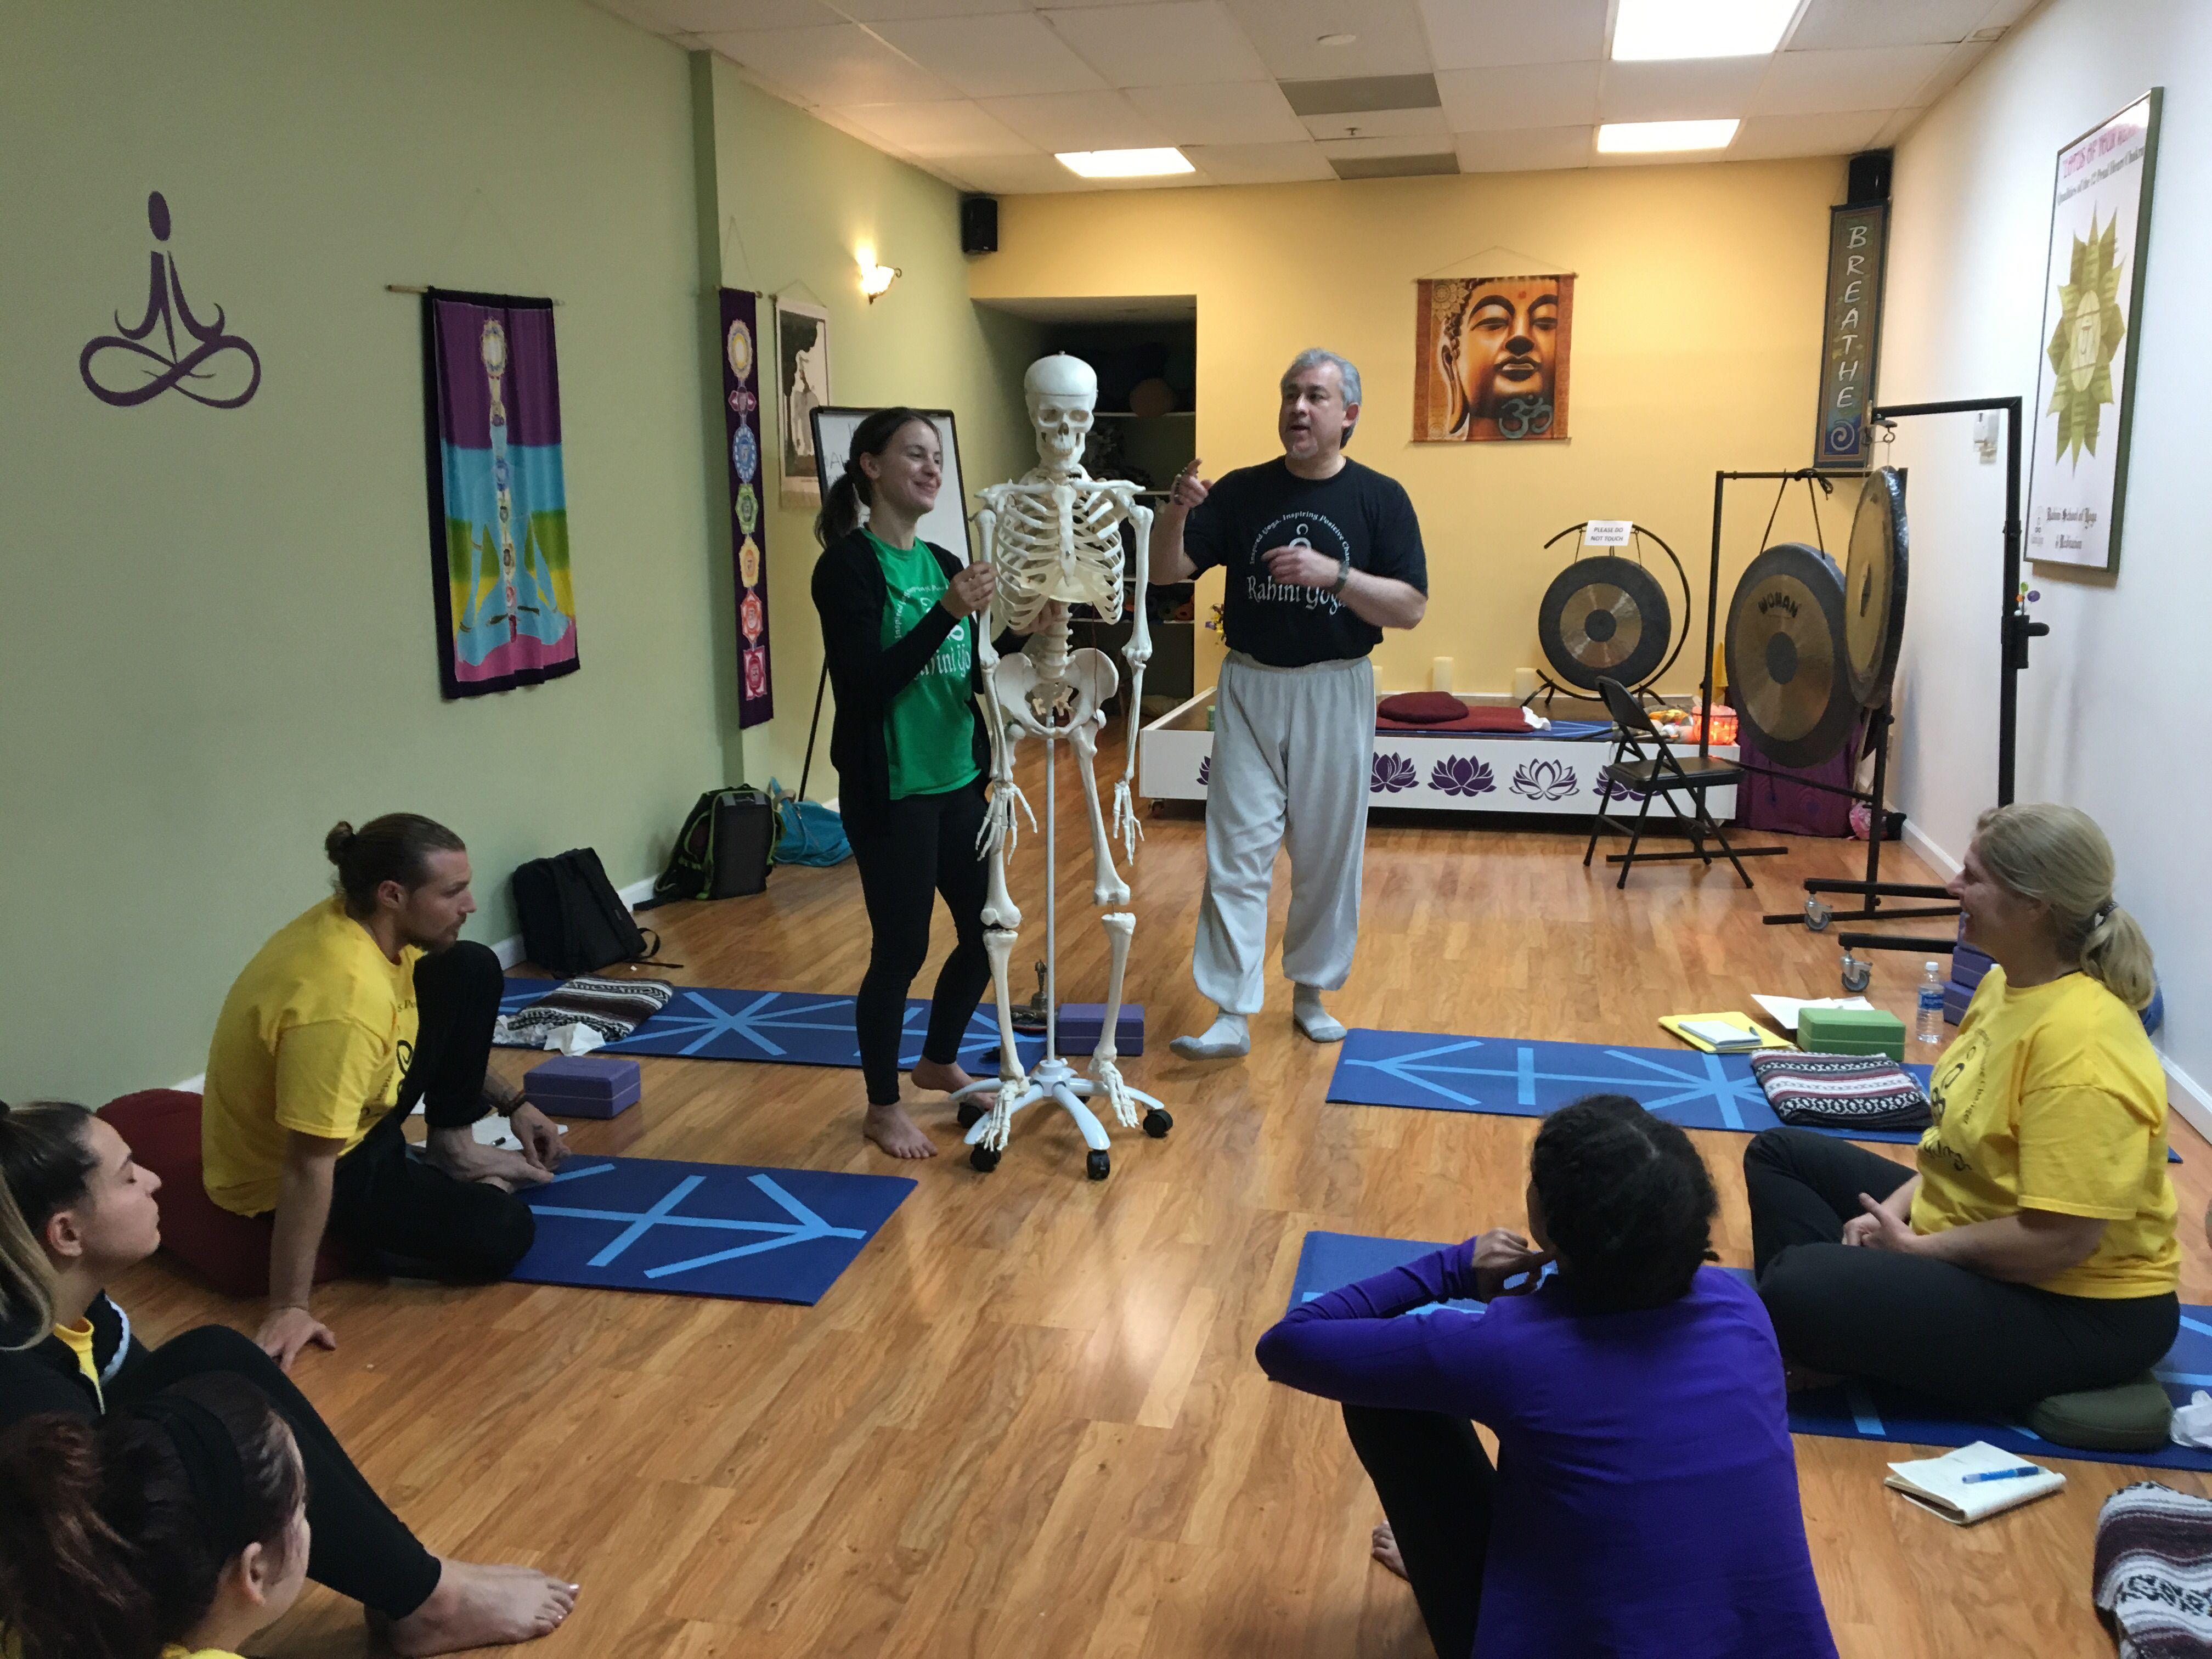 Learning anatomy! (With images) | Yoga teacher training ...